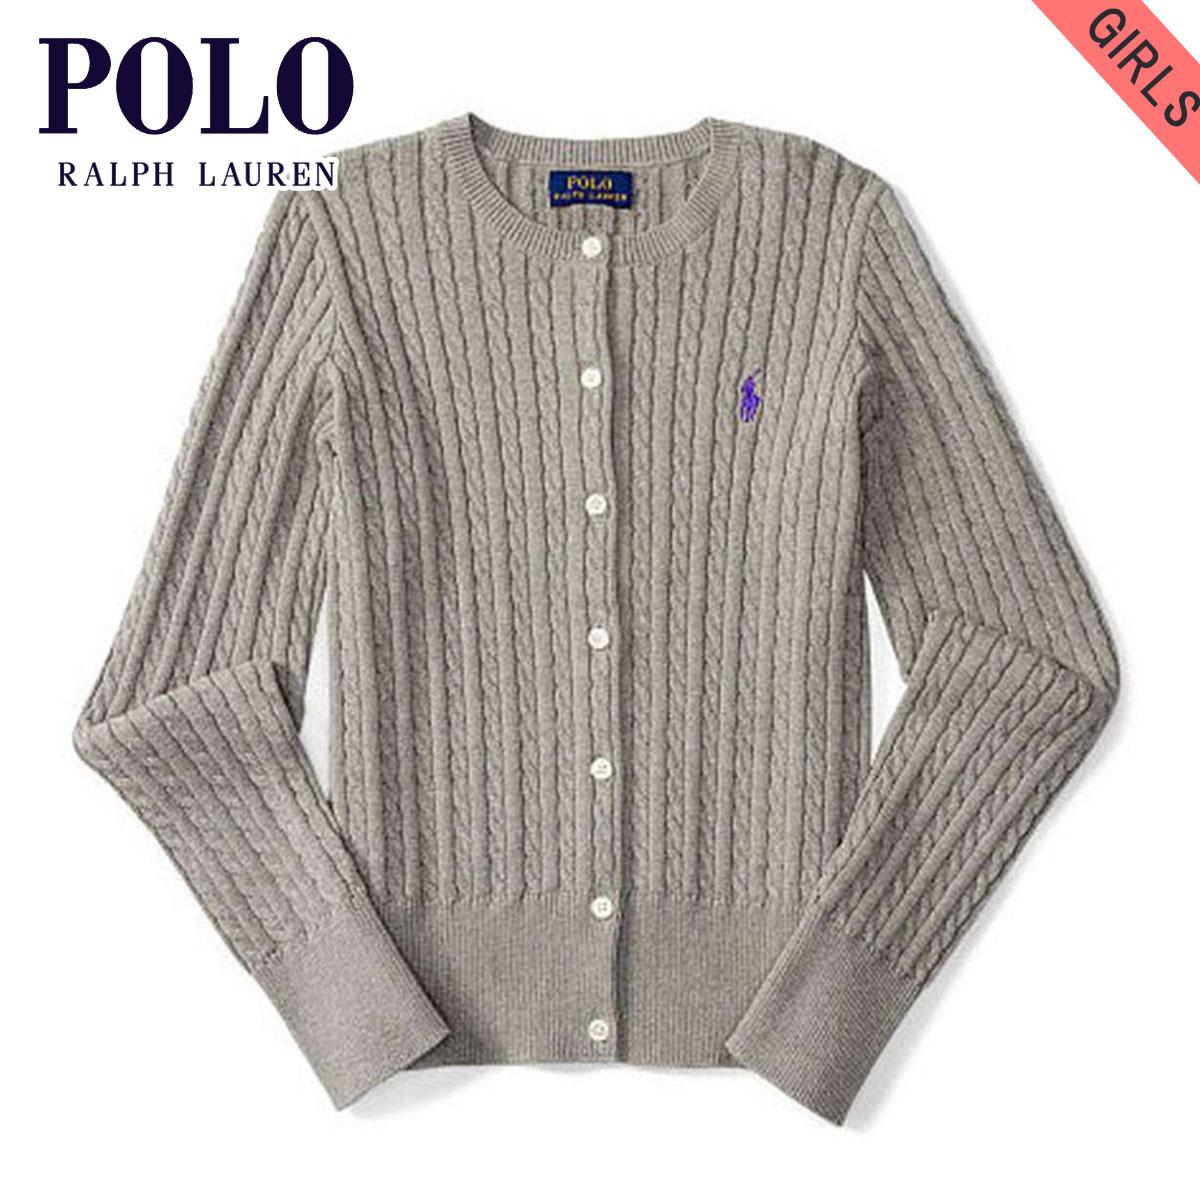 674c018d0507c Polo Ralph Lauren kids sweater girls children's clothes regular article  POLO RALPH LAUREN CHILDREN cardigan MINI-CABLE COTTON CARDIGAN 99493526  D00S20